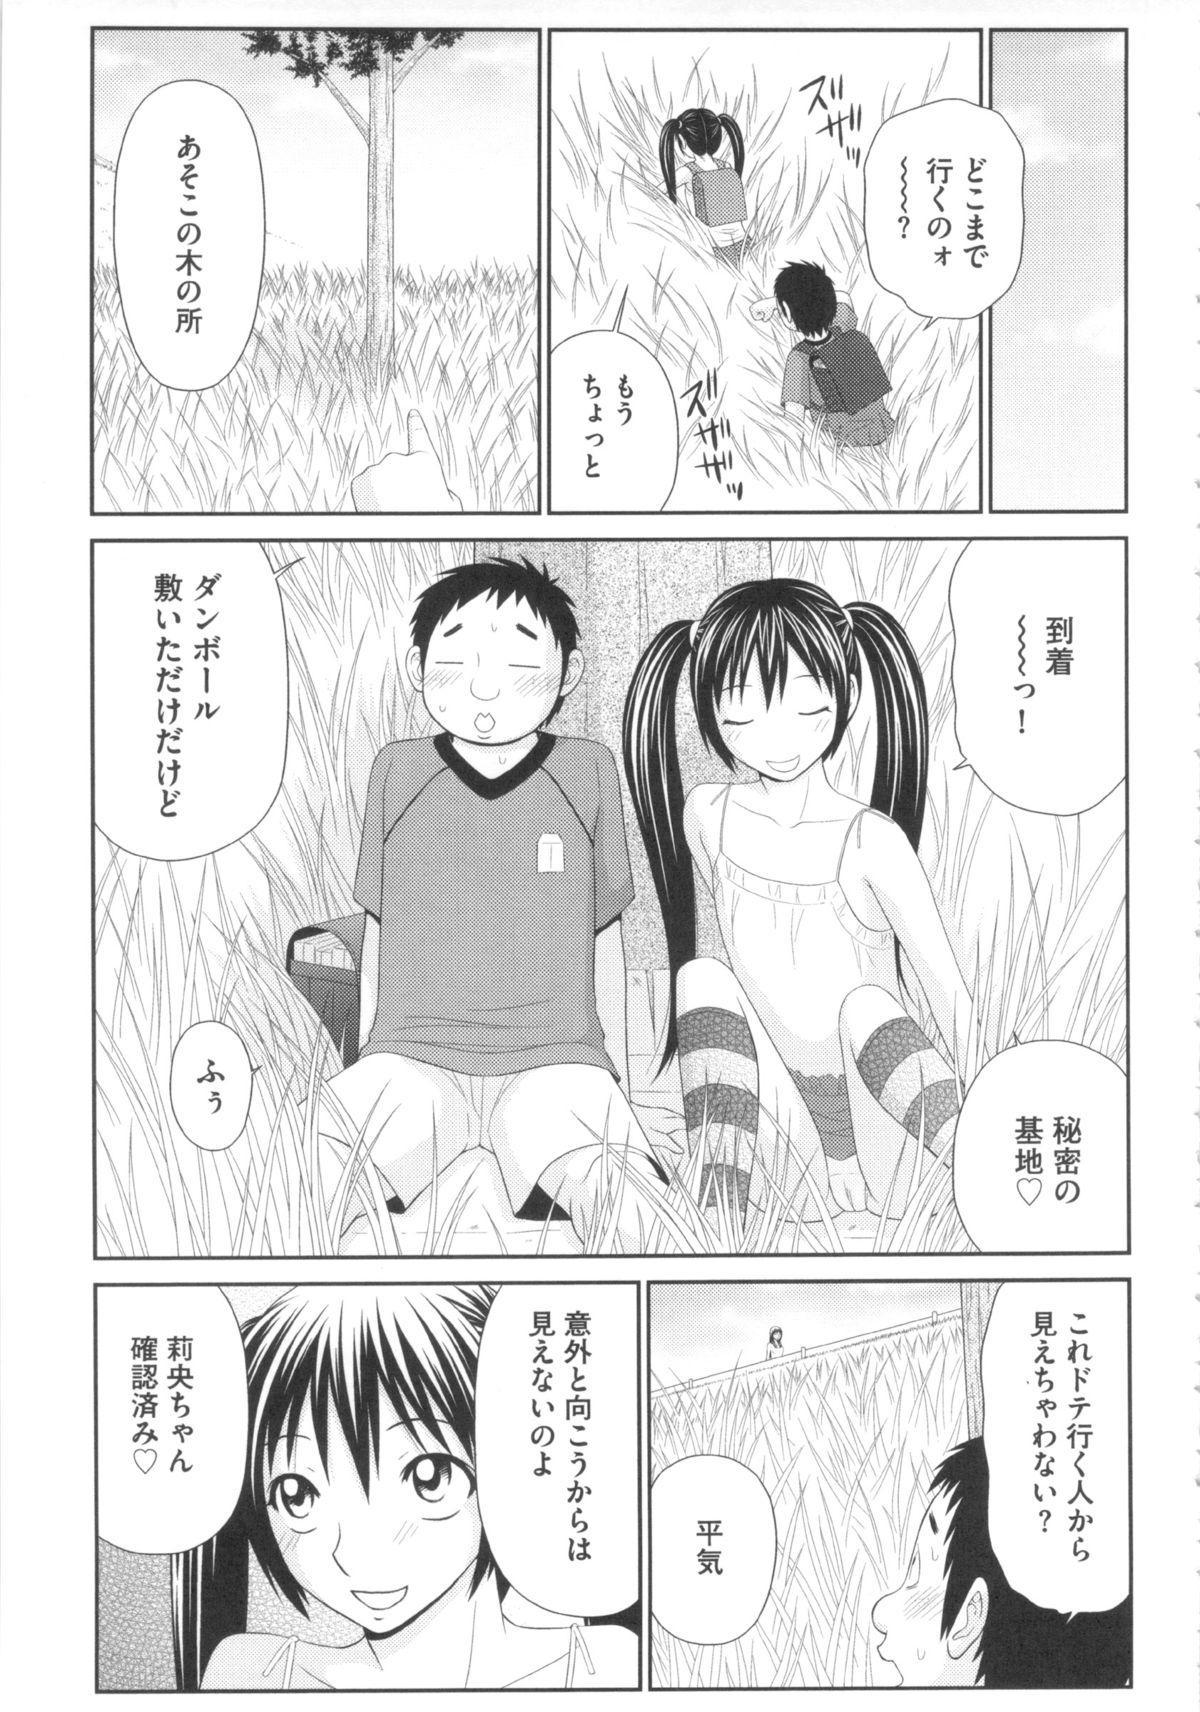 Kiseki No Zaajiru - Sperm of Miracle 127